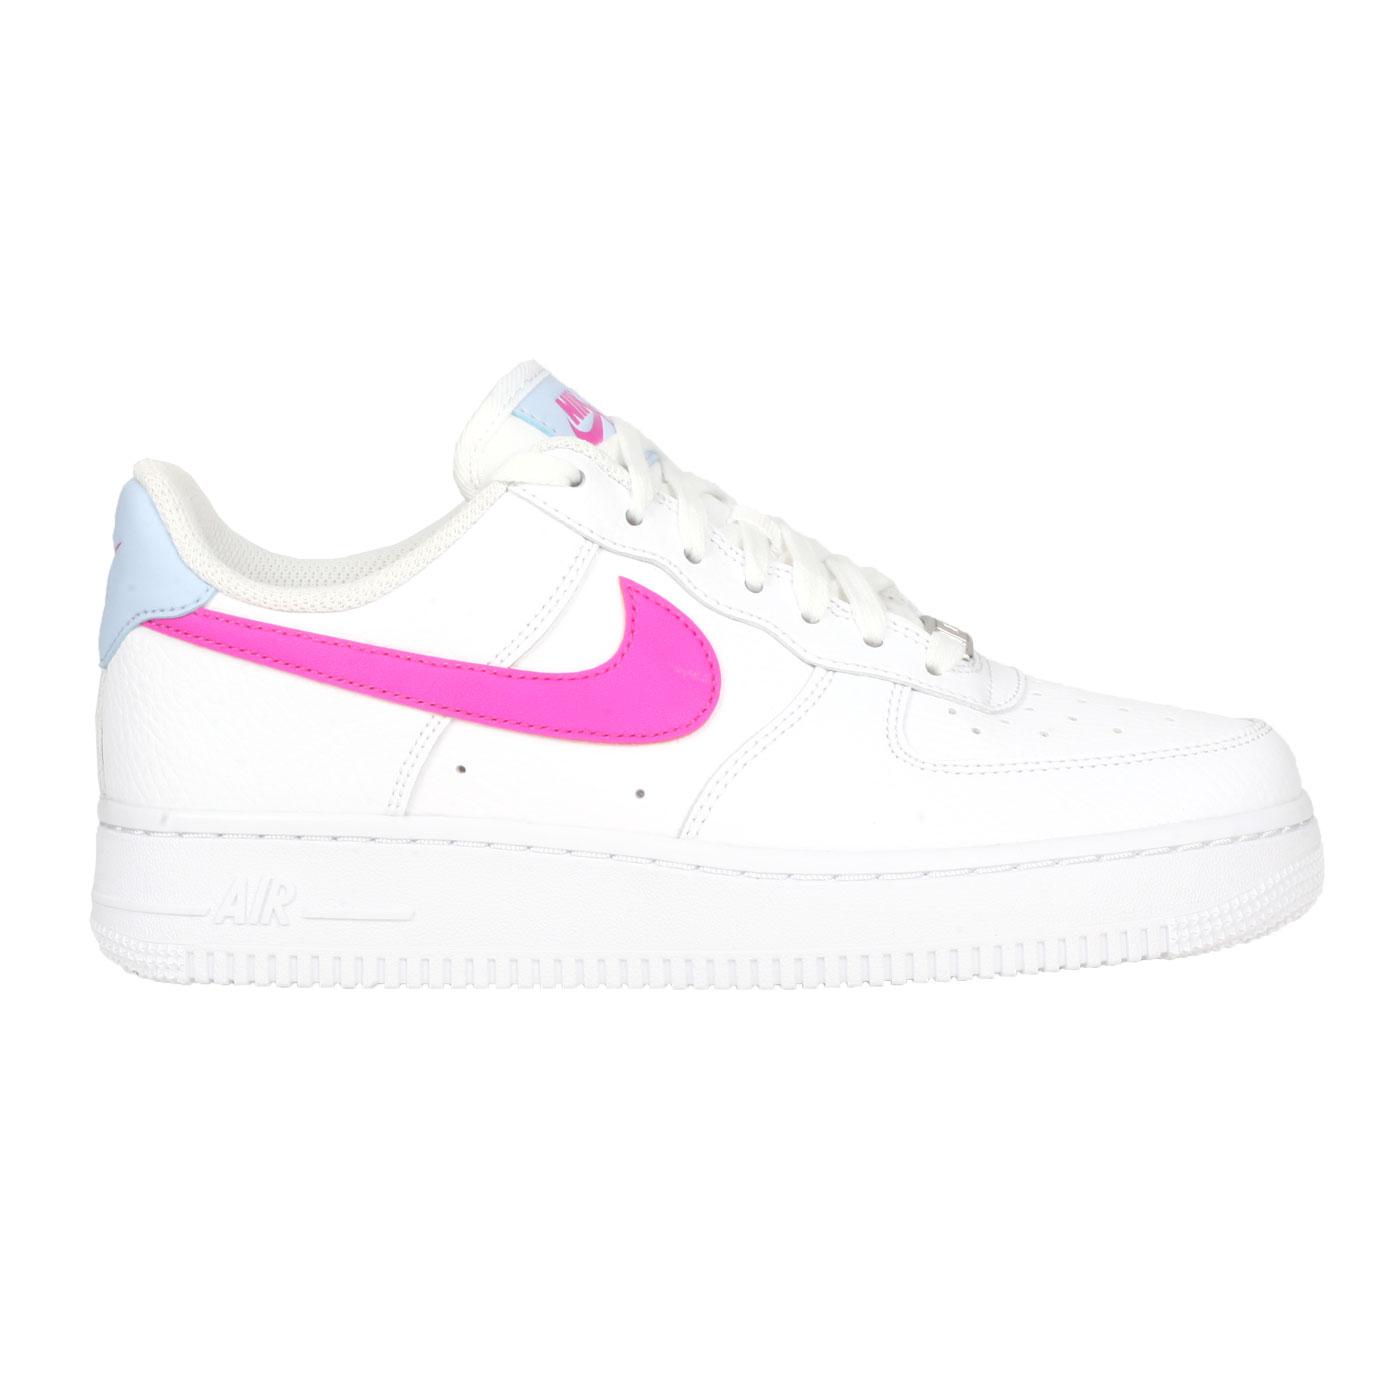 NIKE 女款休閒運動鞋  @WMNS AIR FORCE 1'07@CT4328101 - 白粉藍桃紅